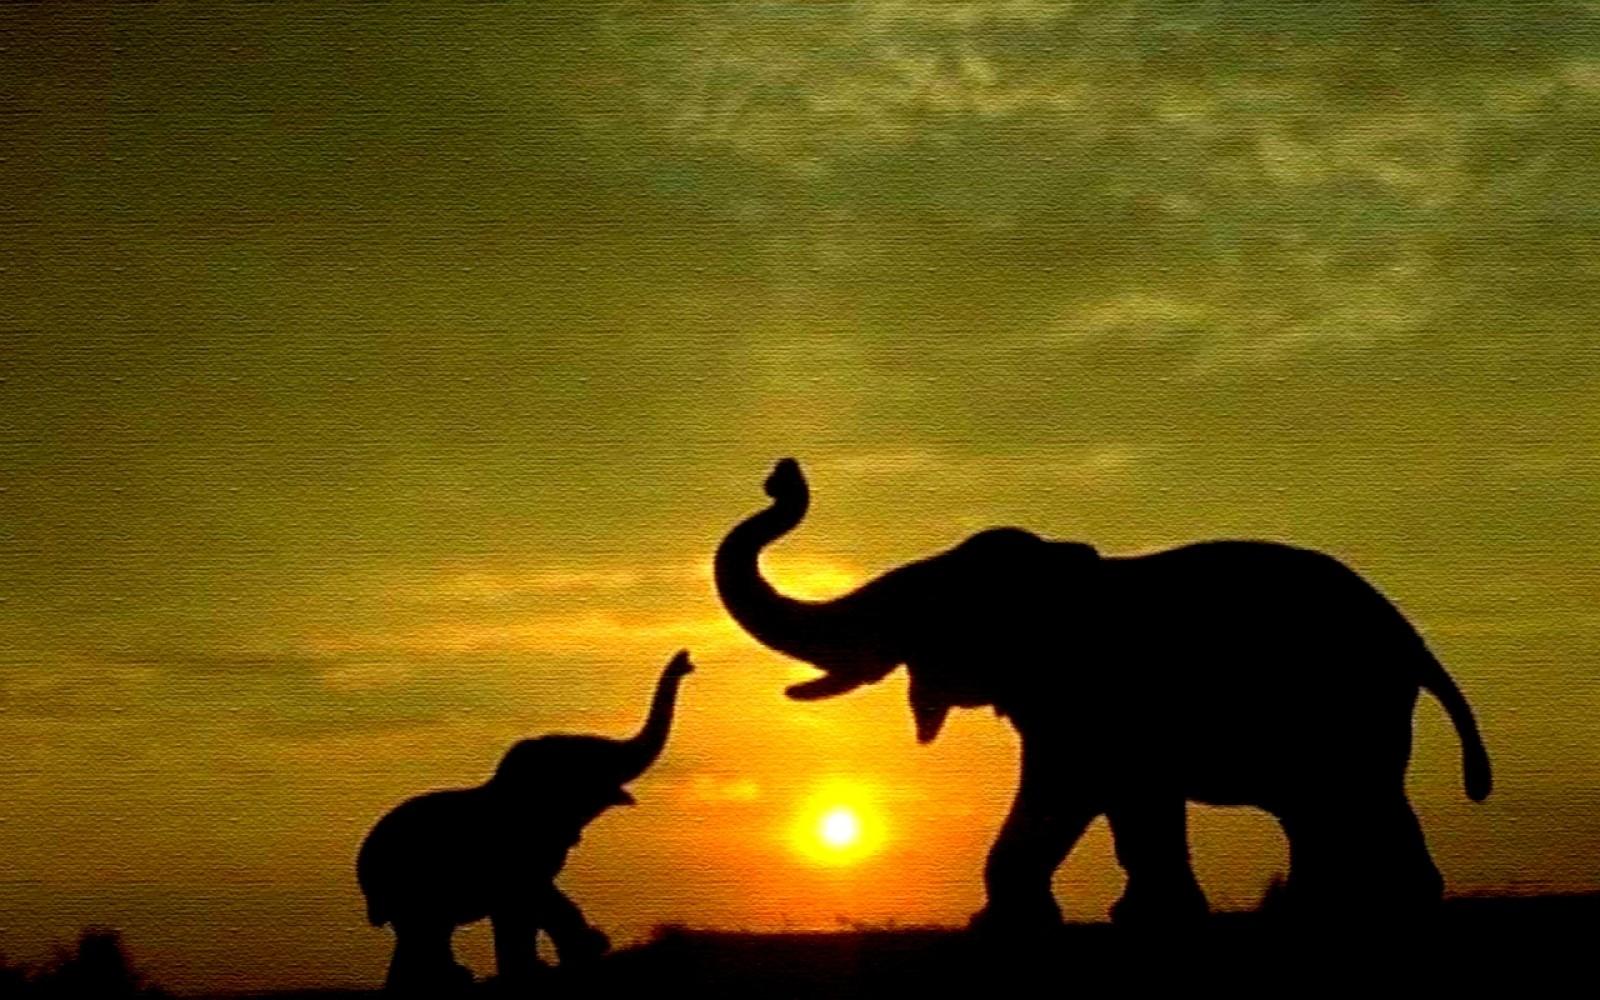 elephant wallpaper 10462